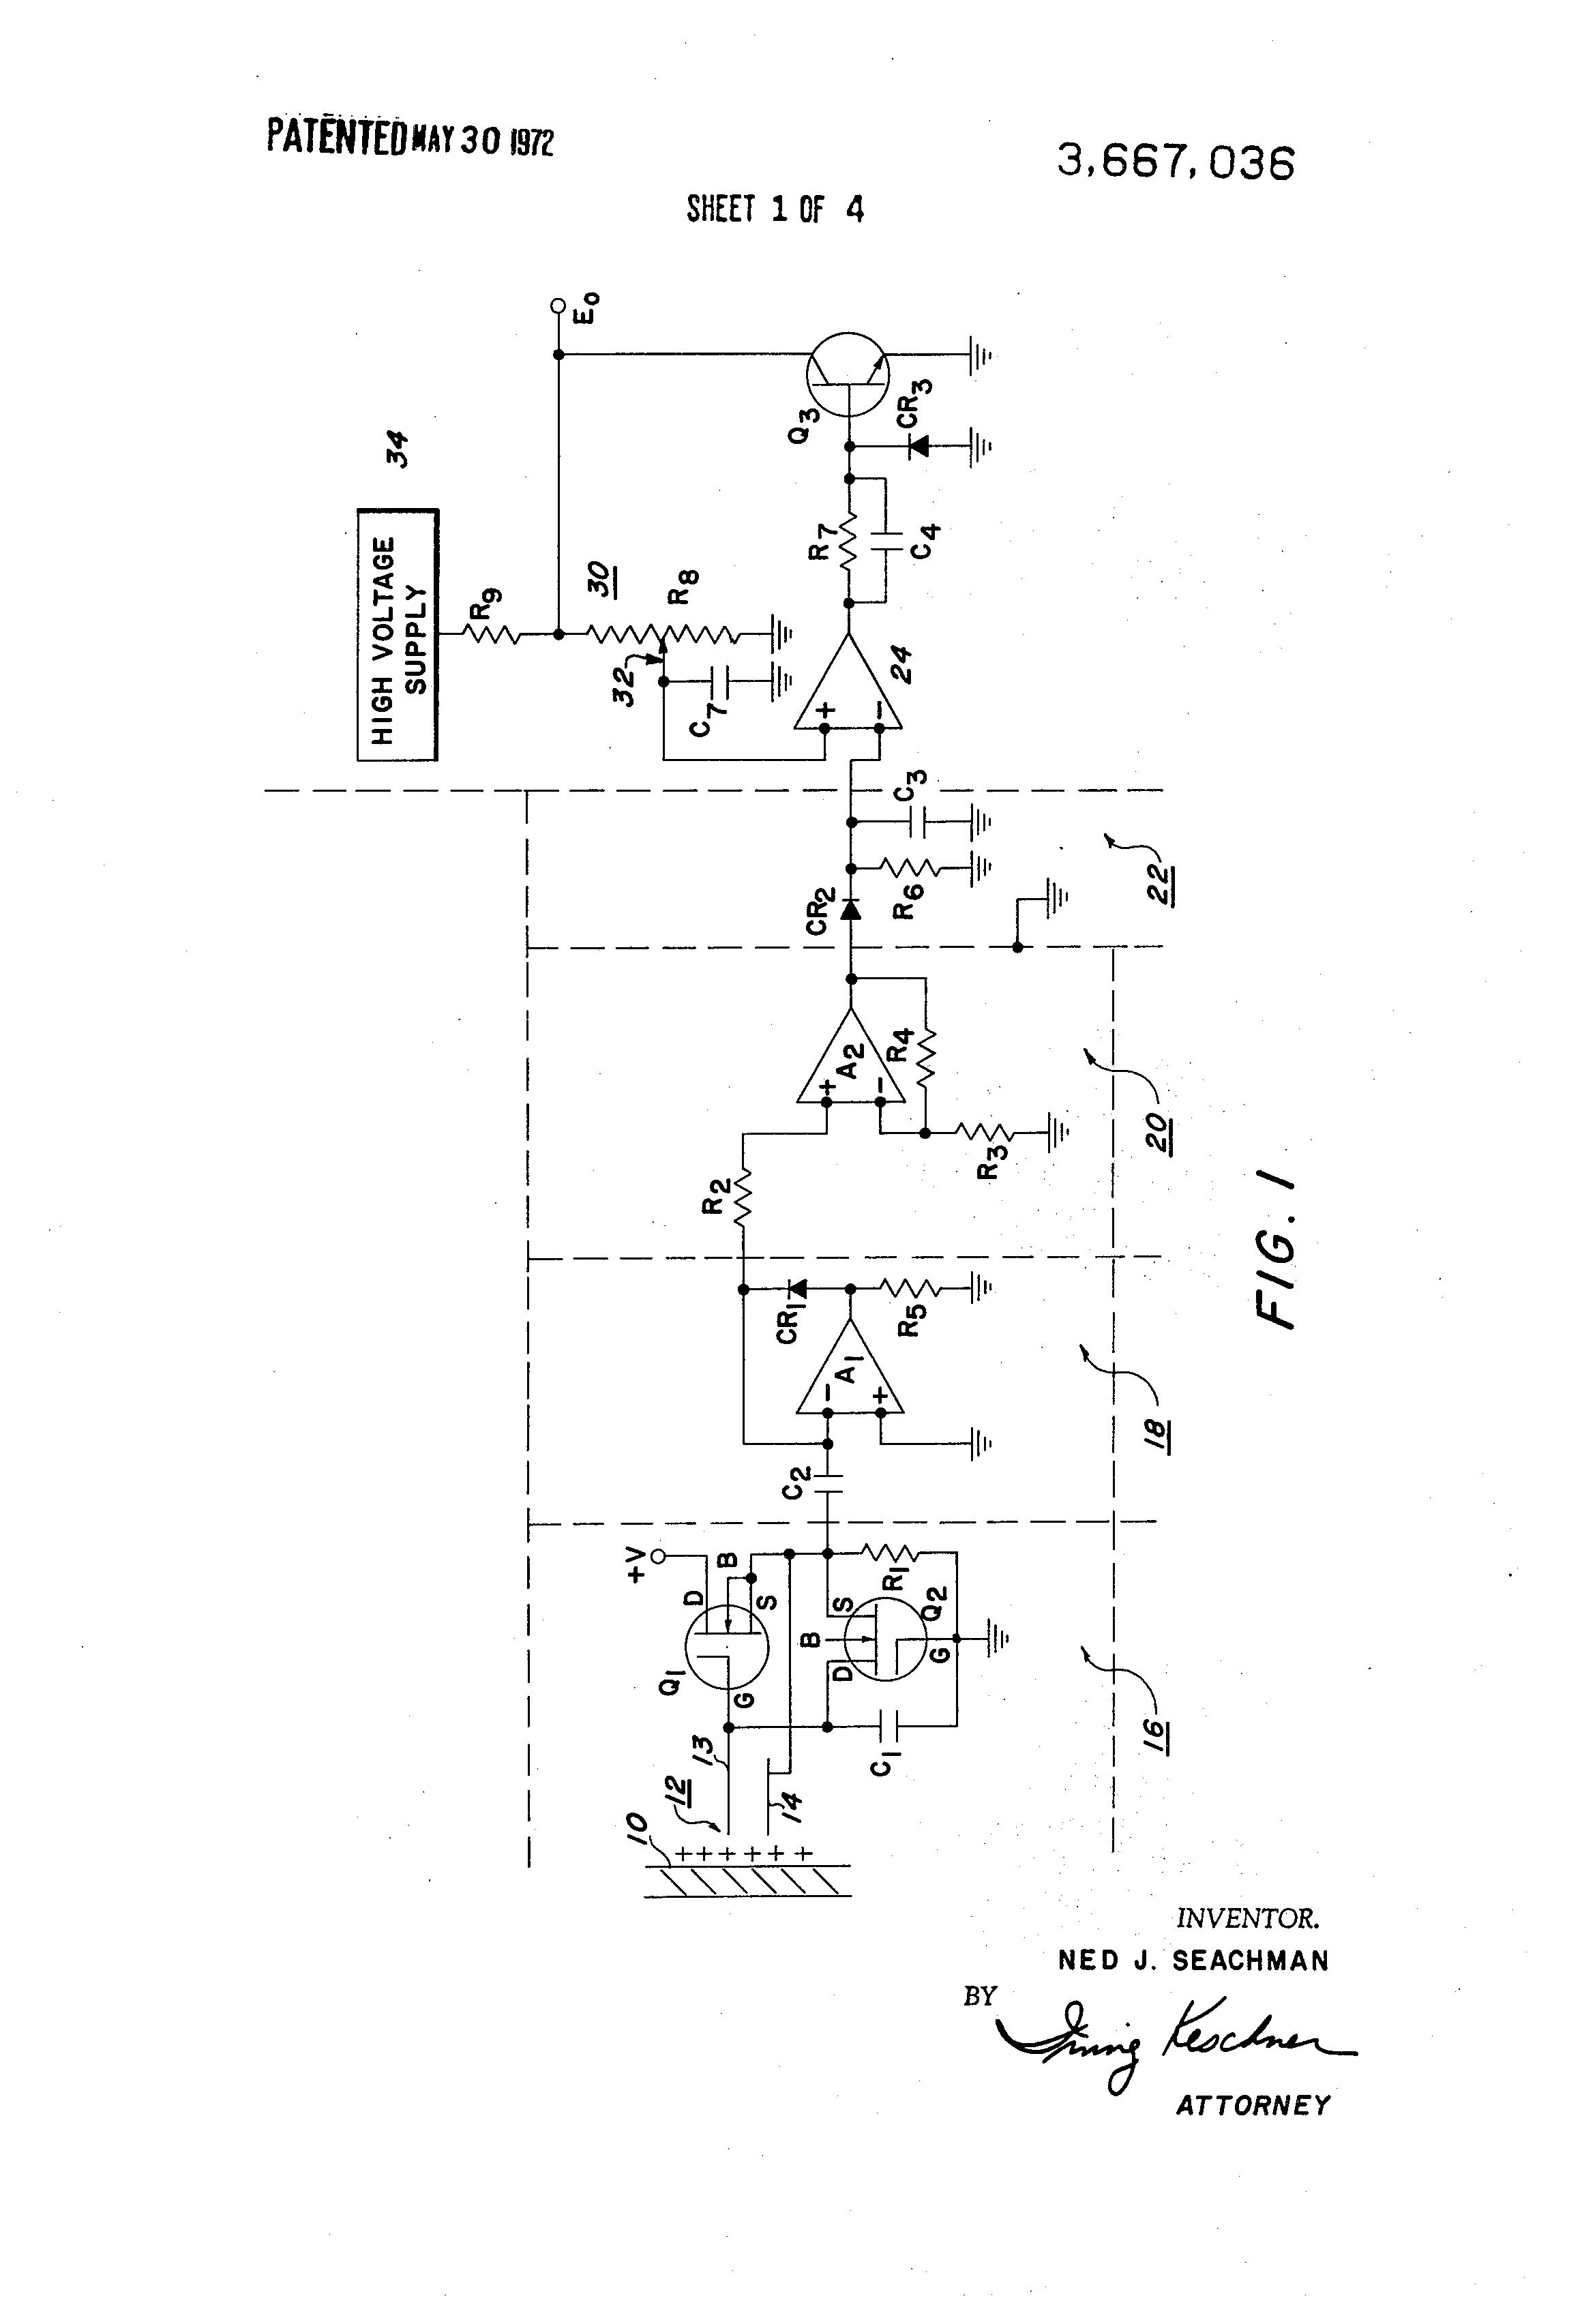 Electrometer Schematic Circuit 10 Amp Constant Current Load Measuringandtestcircuit